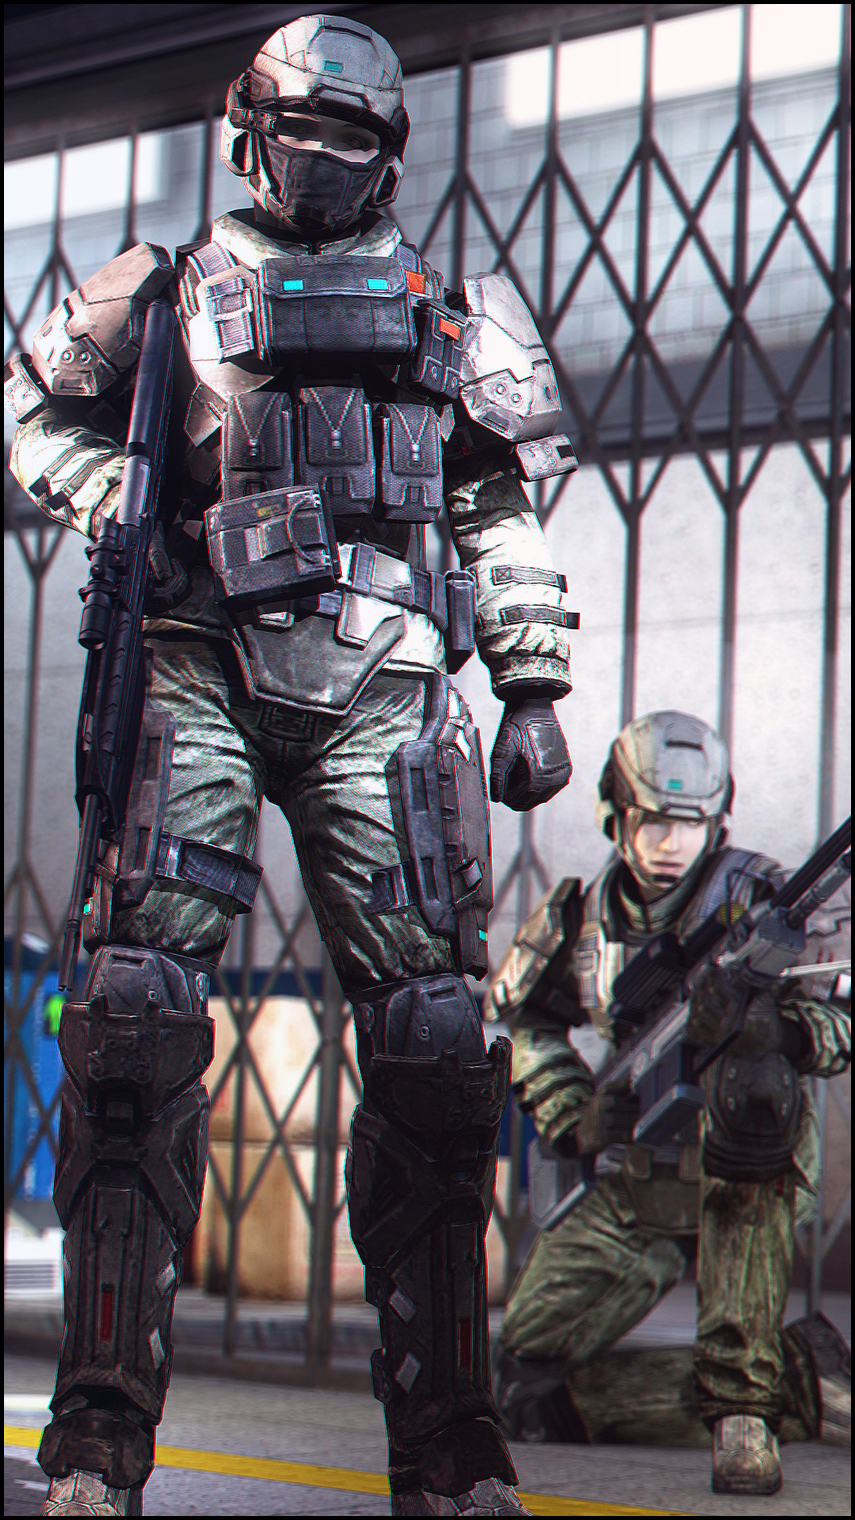 UNSC Army Trooper by Slim-Charles